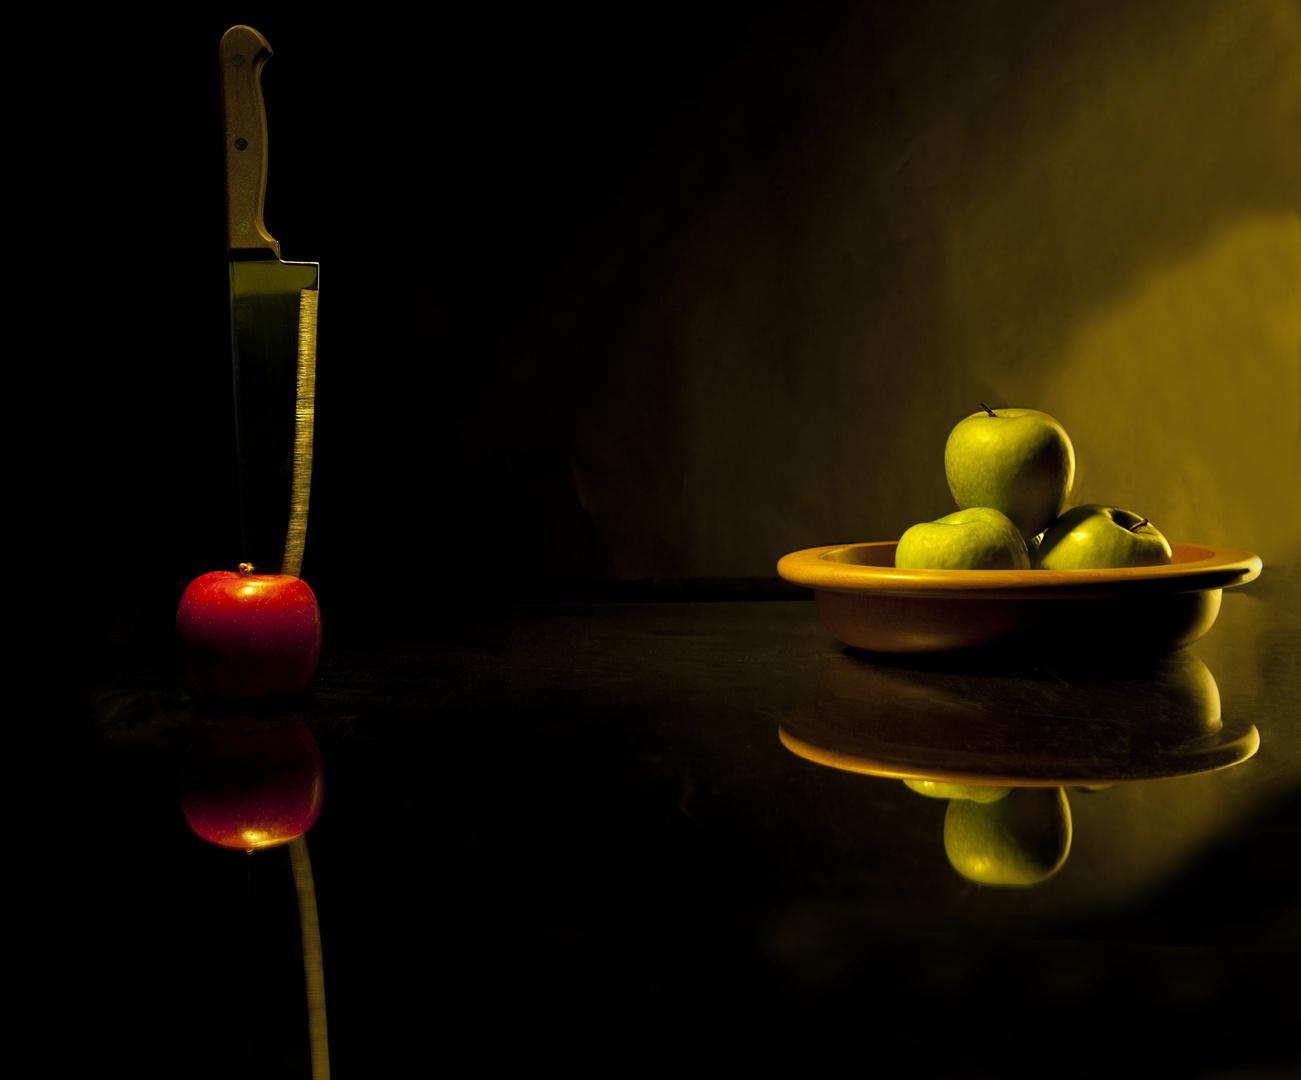 Apfel Mord und Diskriminierung